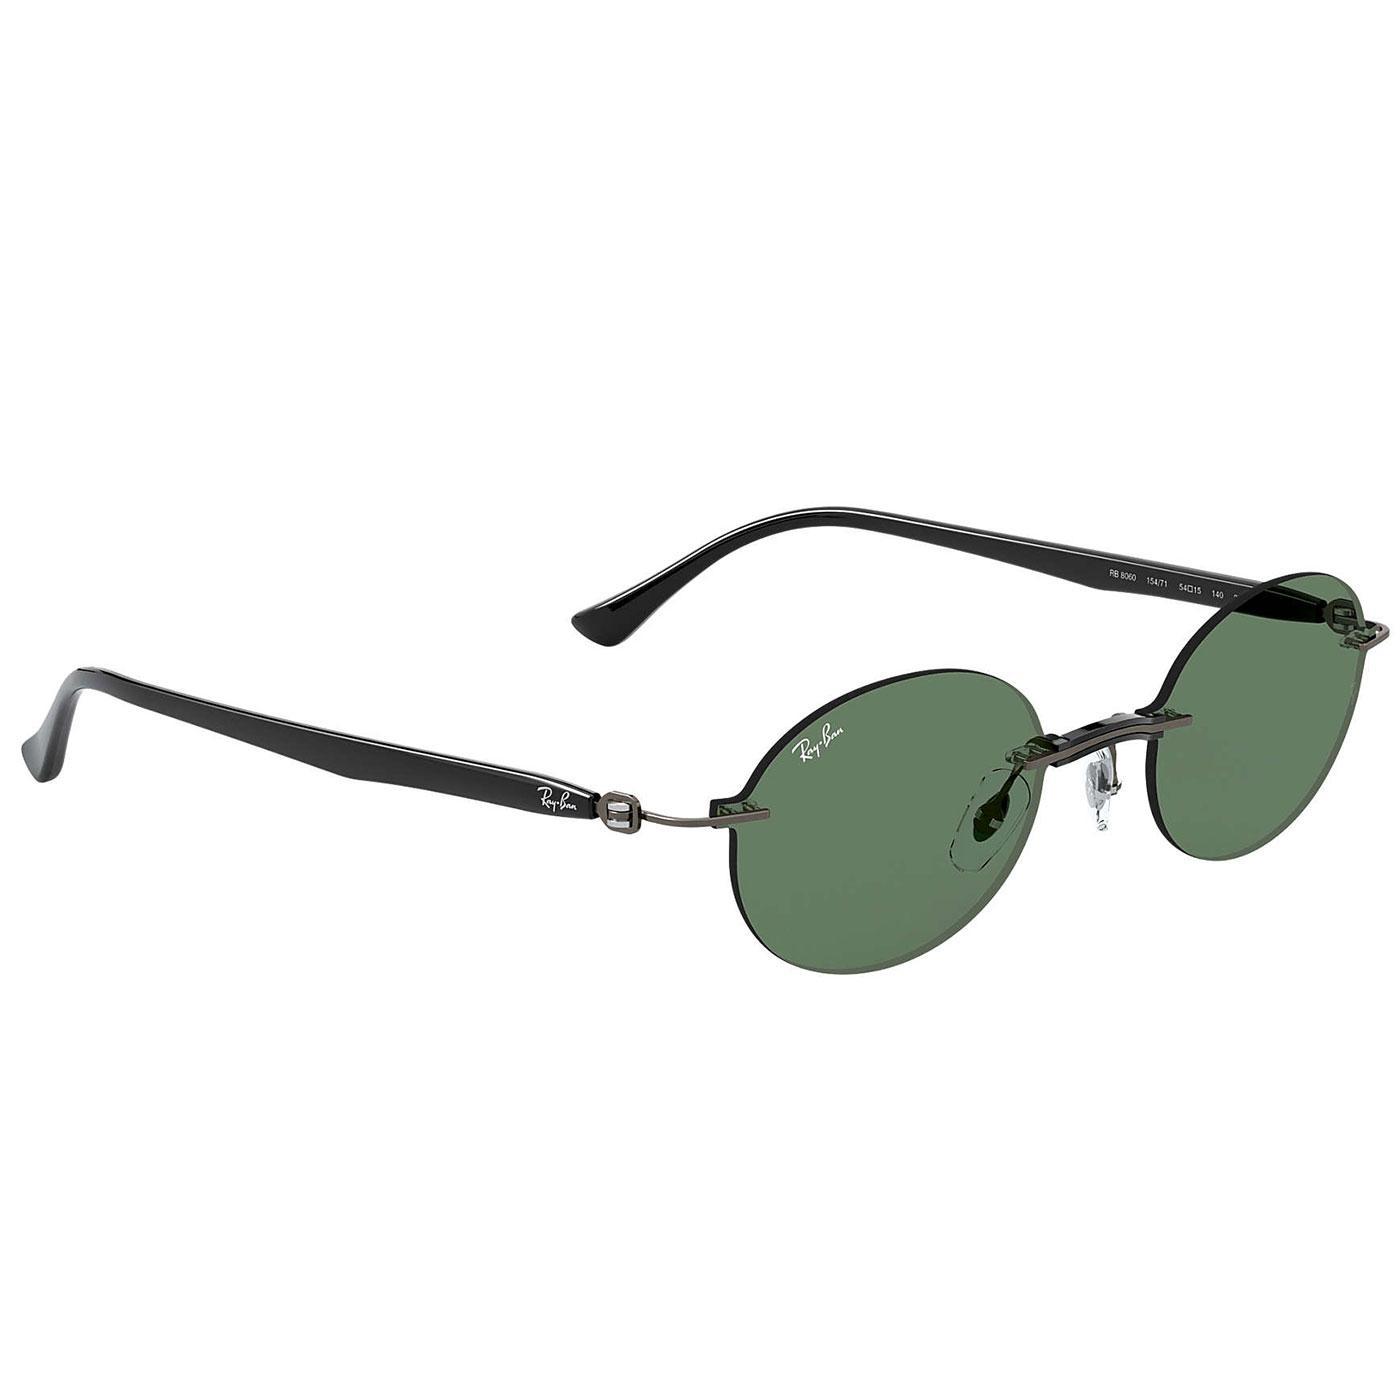 RAY-BAN RB8060 Women's Retro Oval Sunglasses